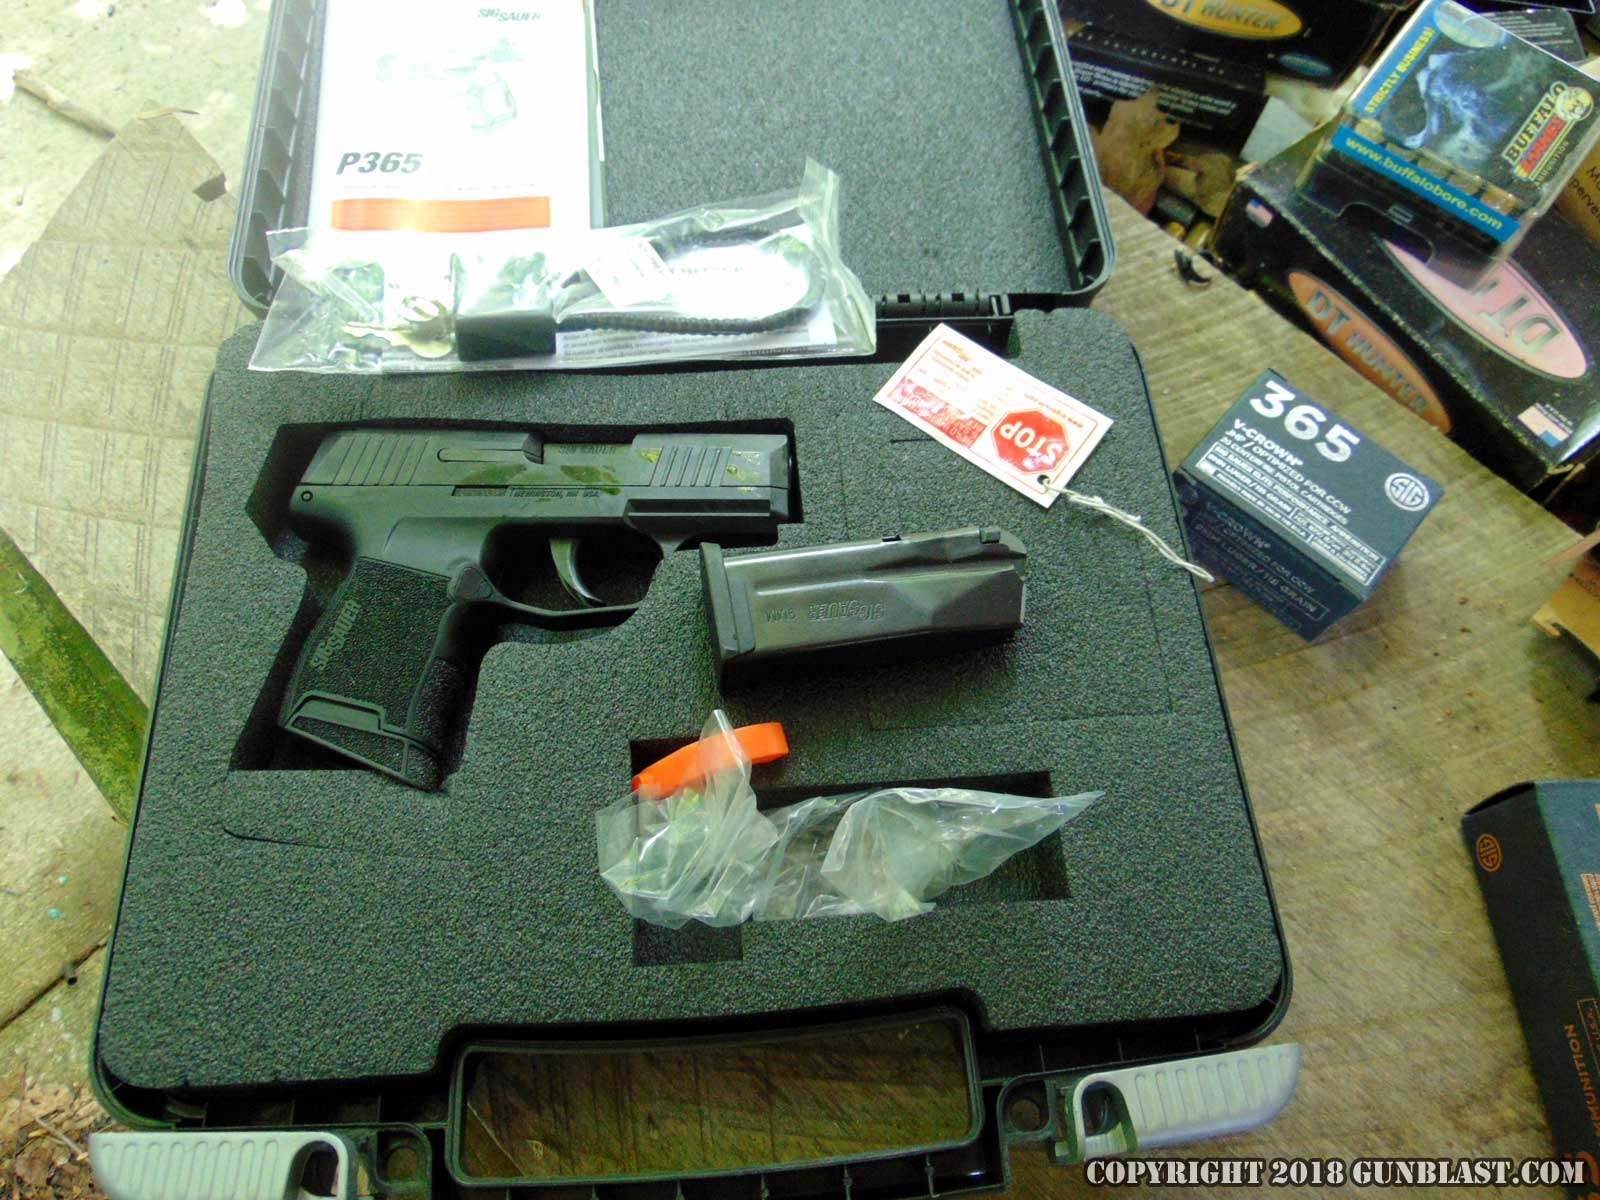 Sig Sauer P365 Sub-Compact 9x19mm Semi-Automatic Pistol